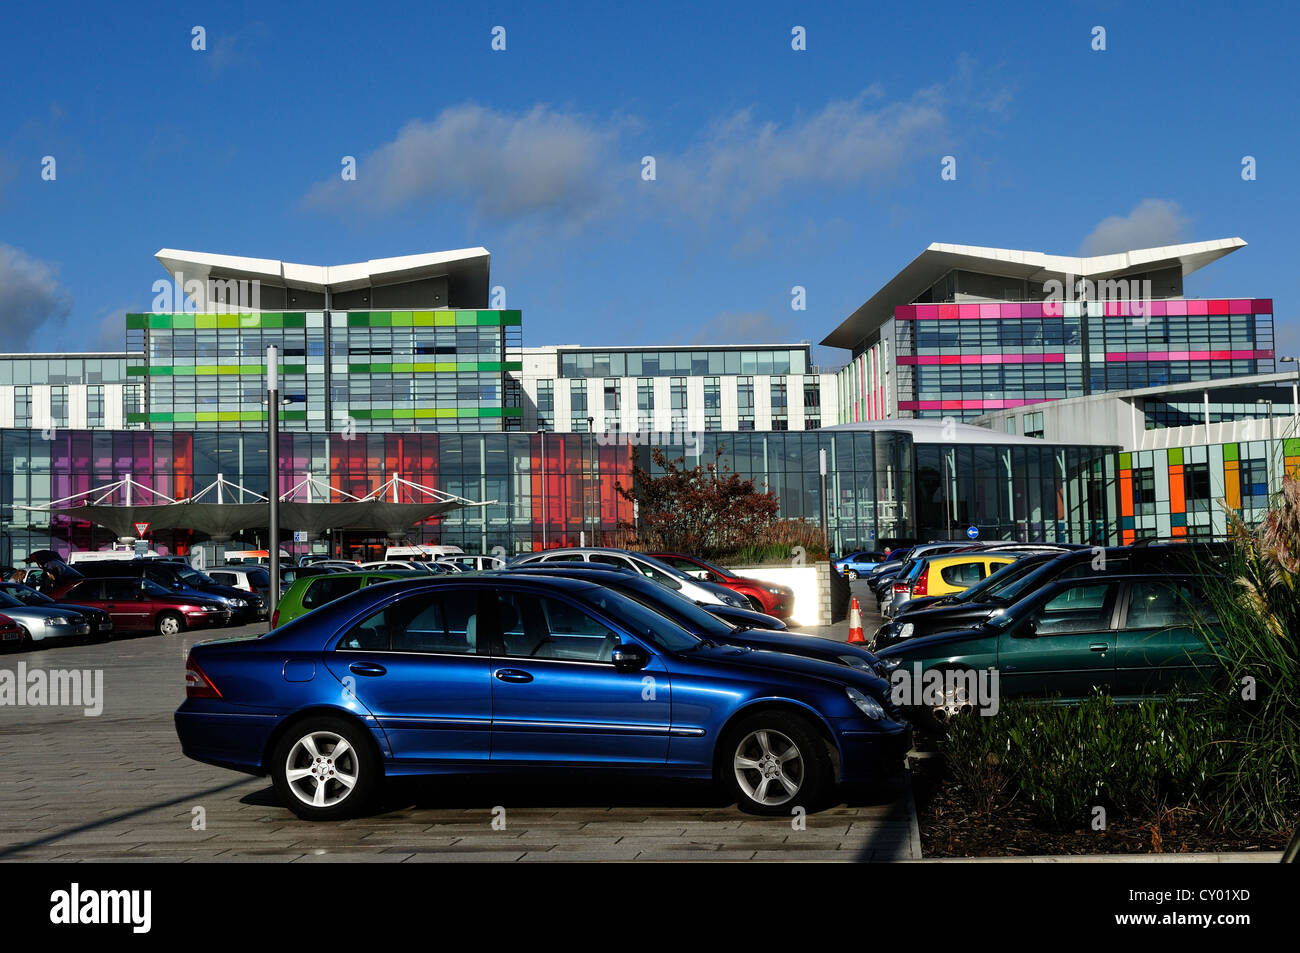 Sutton In Ashfield Car Parks